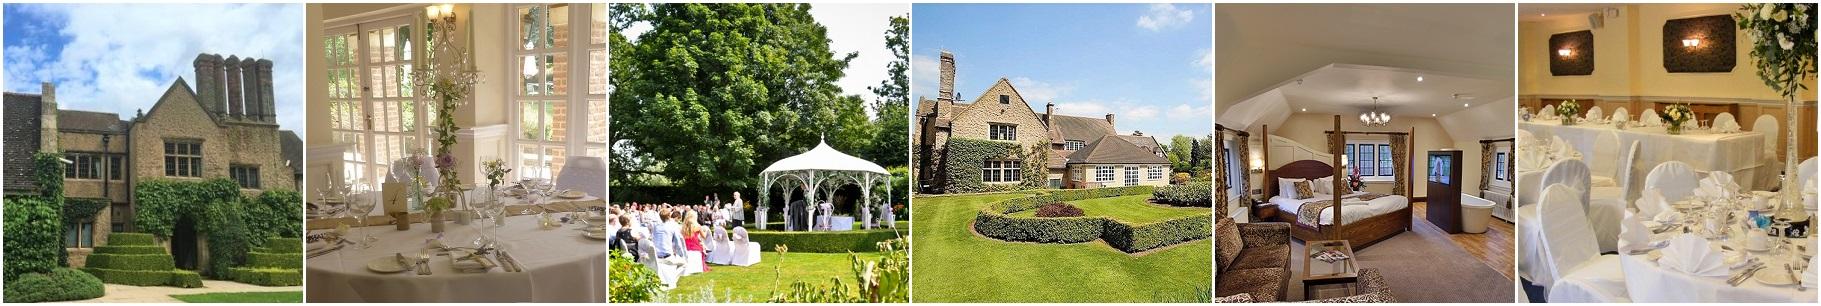 Quorn Grange Photos- Leicestershire Wedding Venues